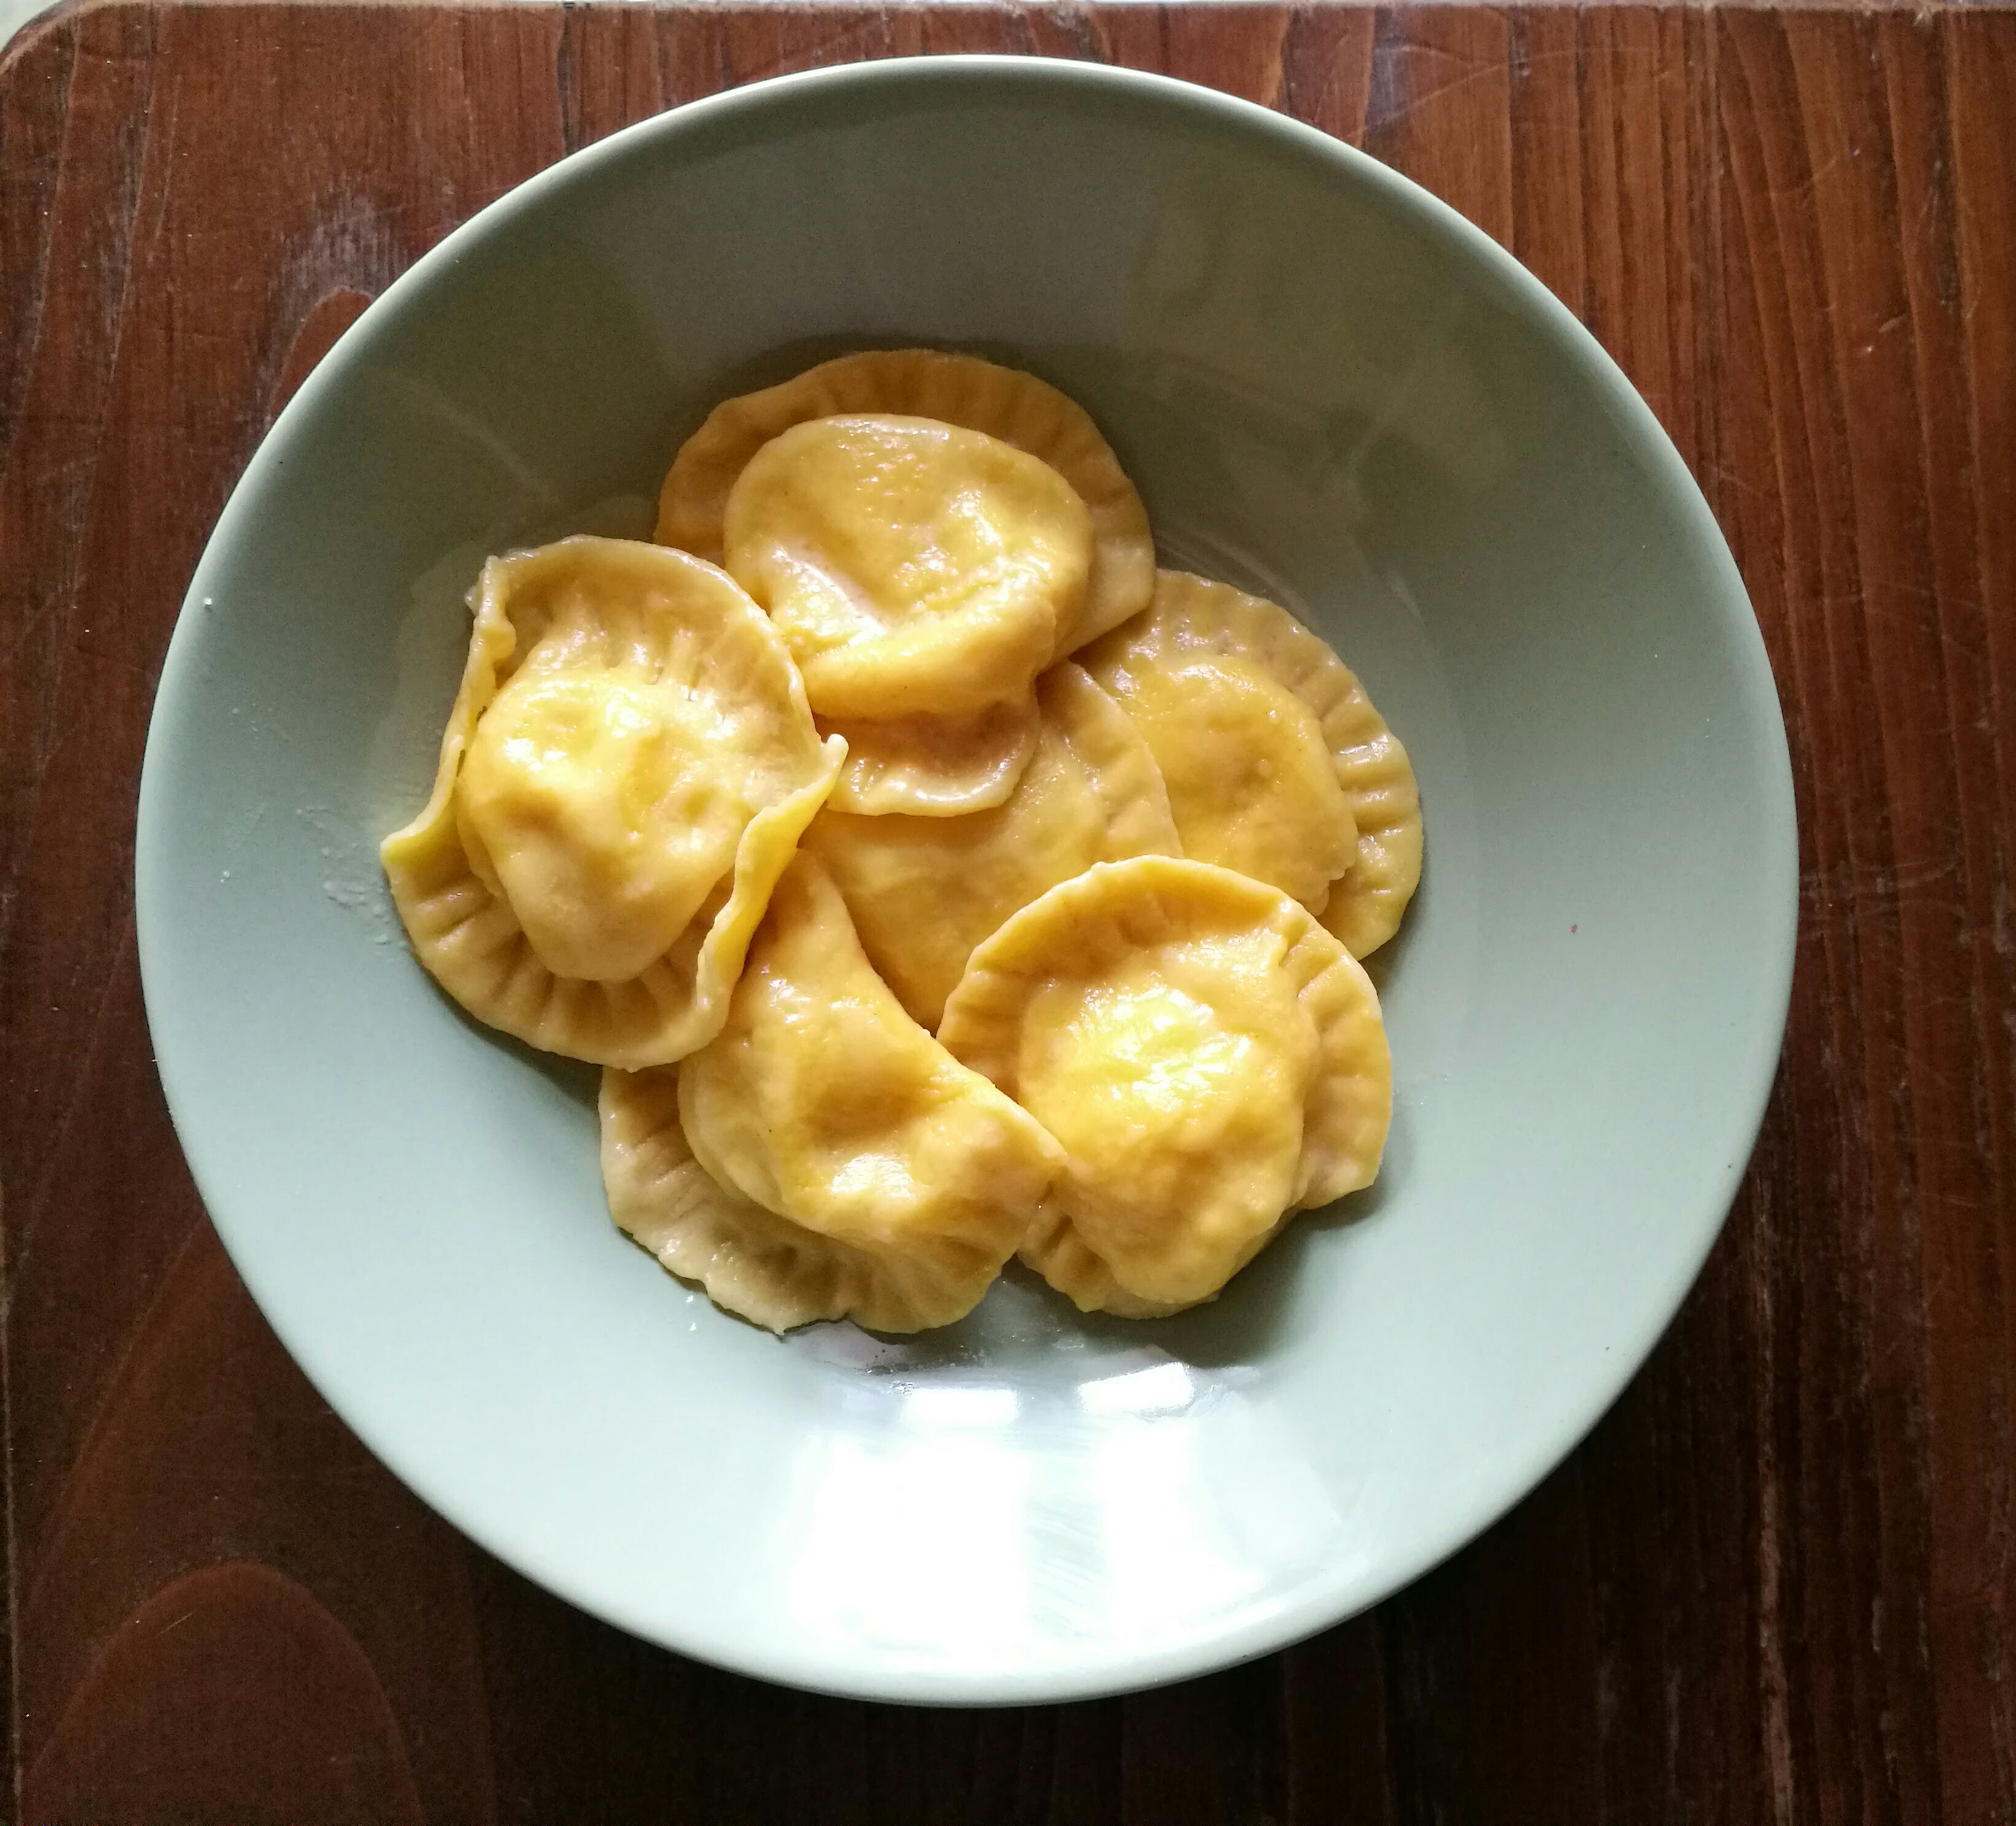 Ravioli di patate e pancetta croccante